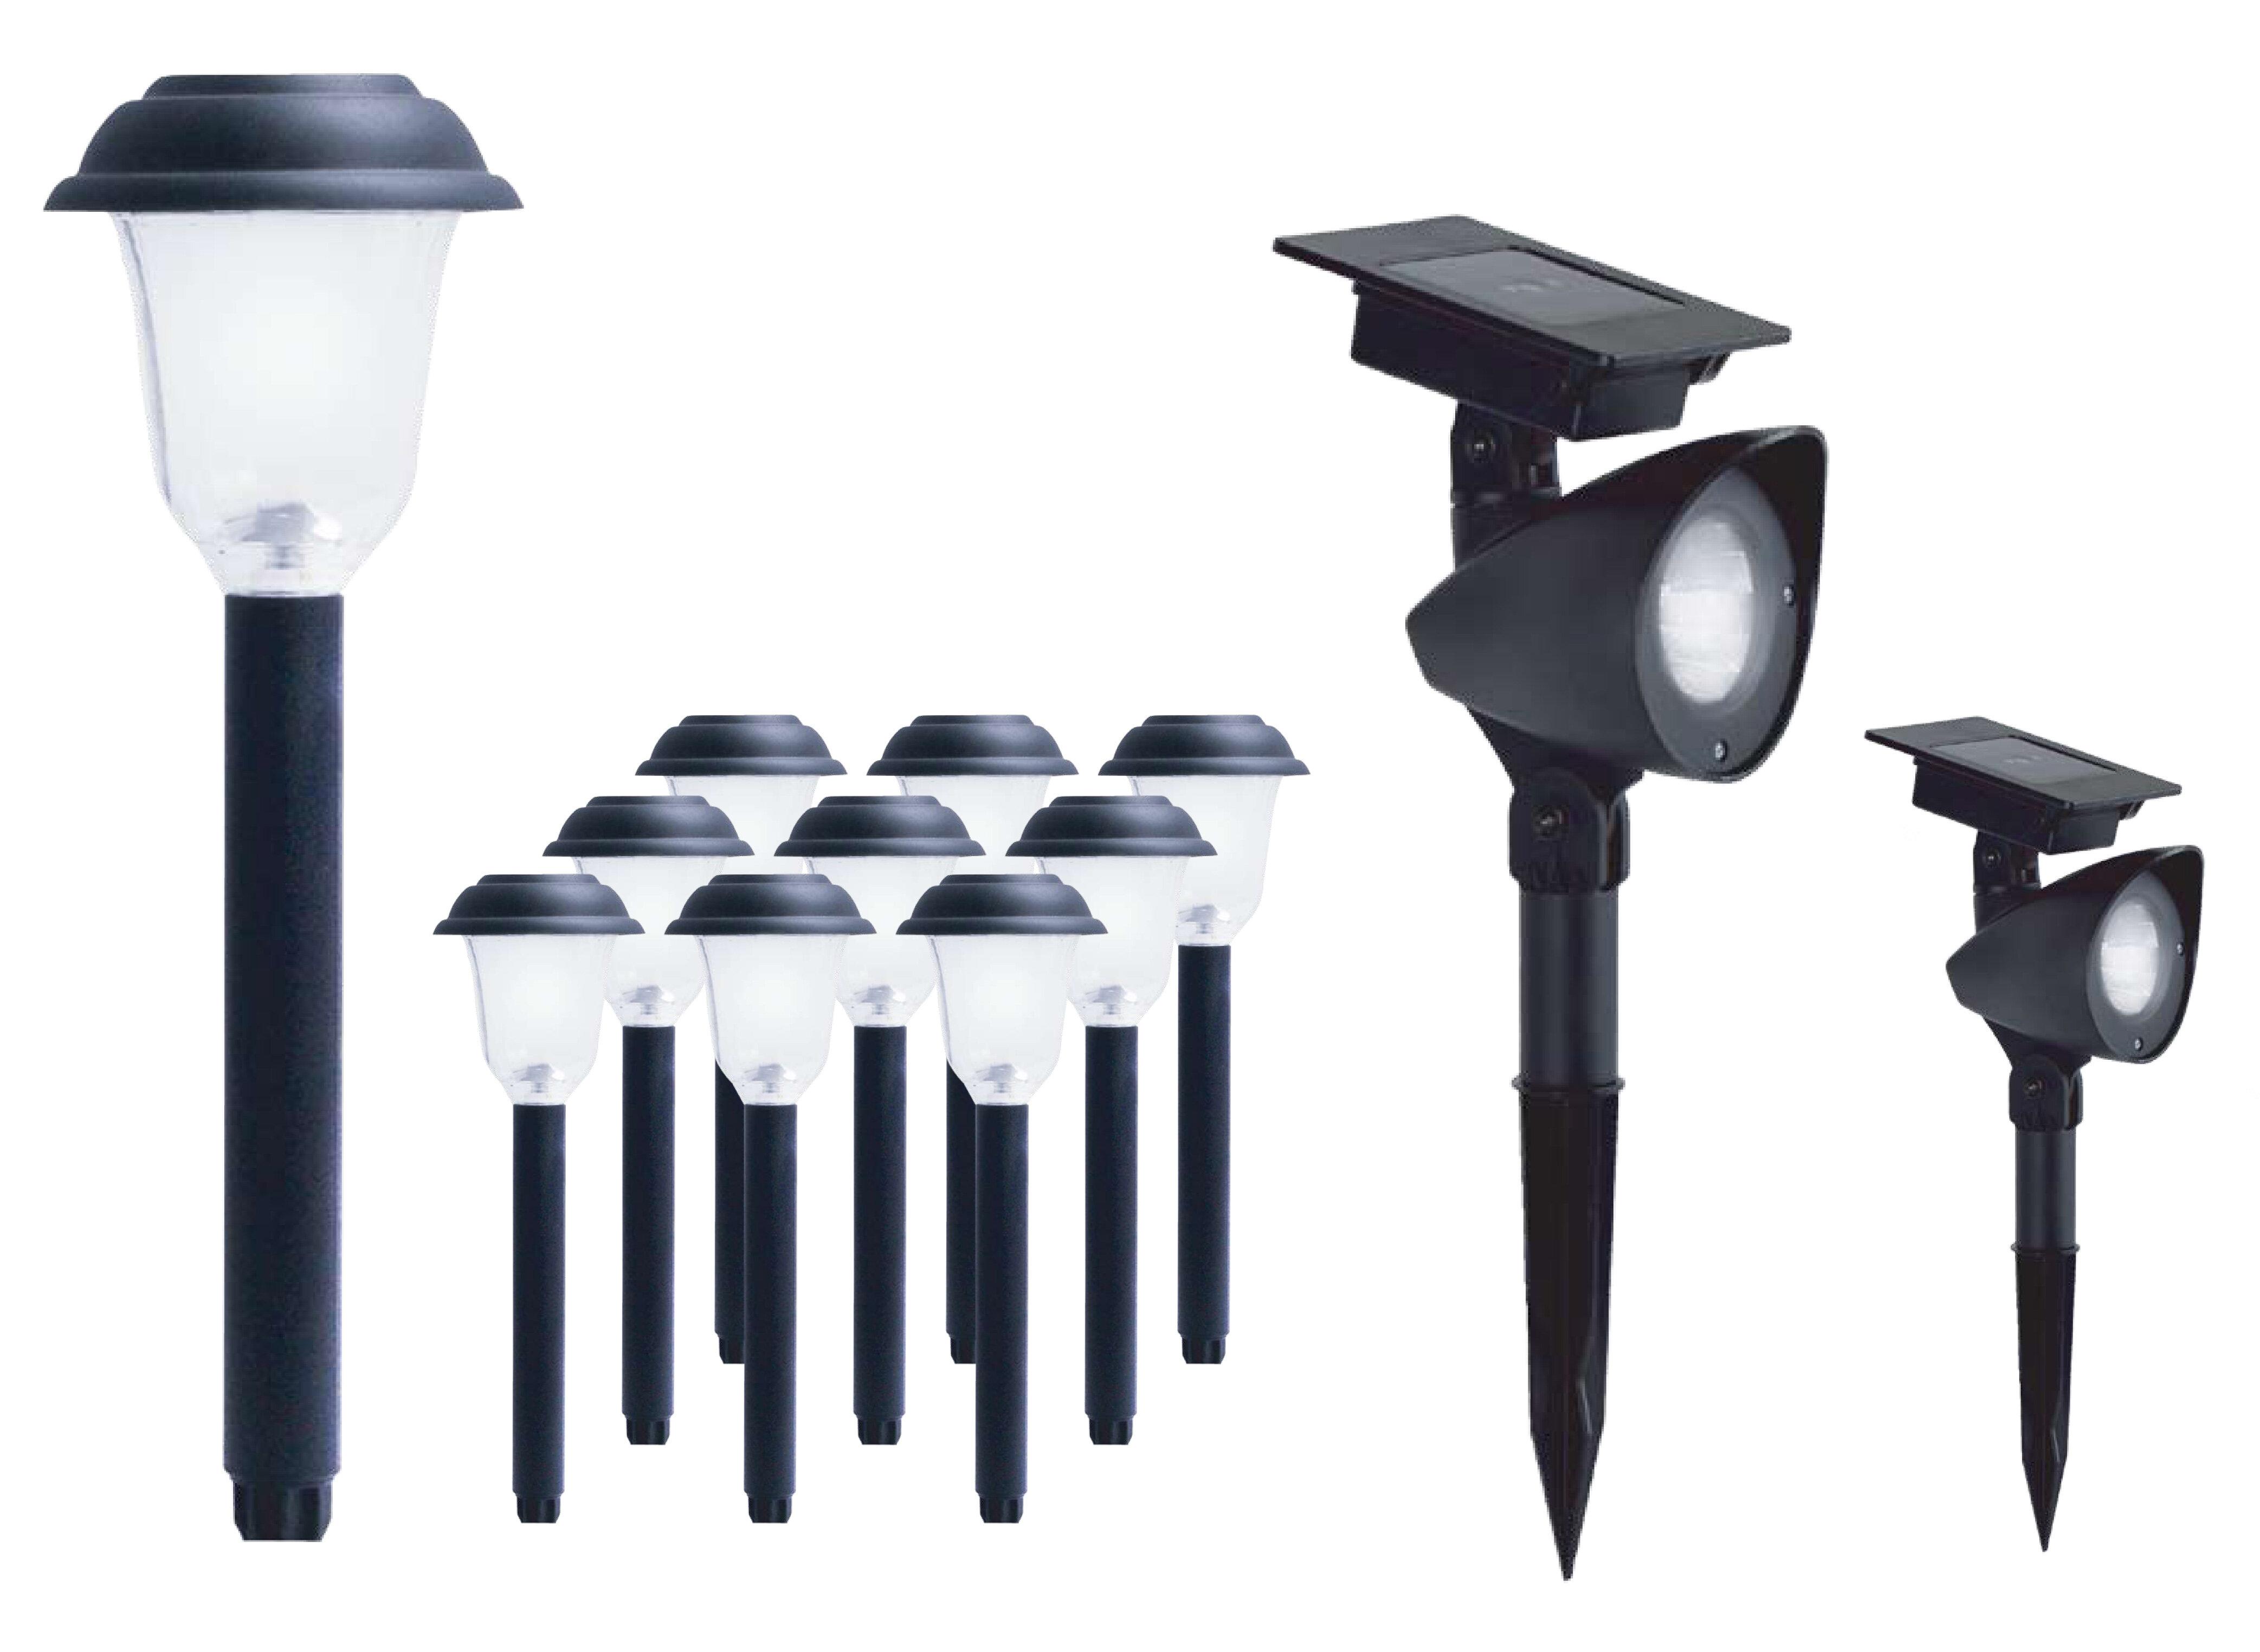 jiawei technology led landscape lighting set reviews wayfair